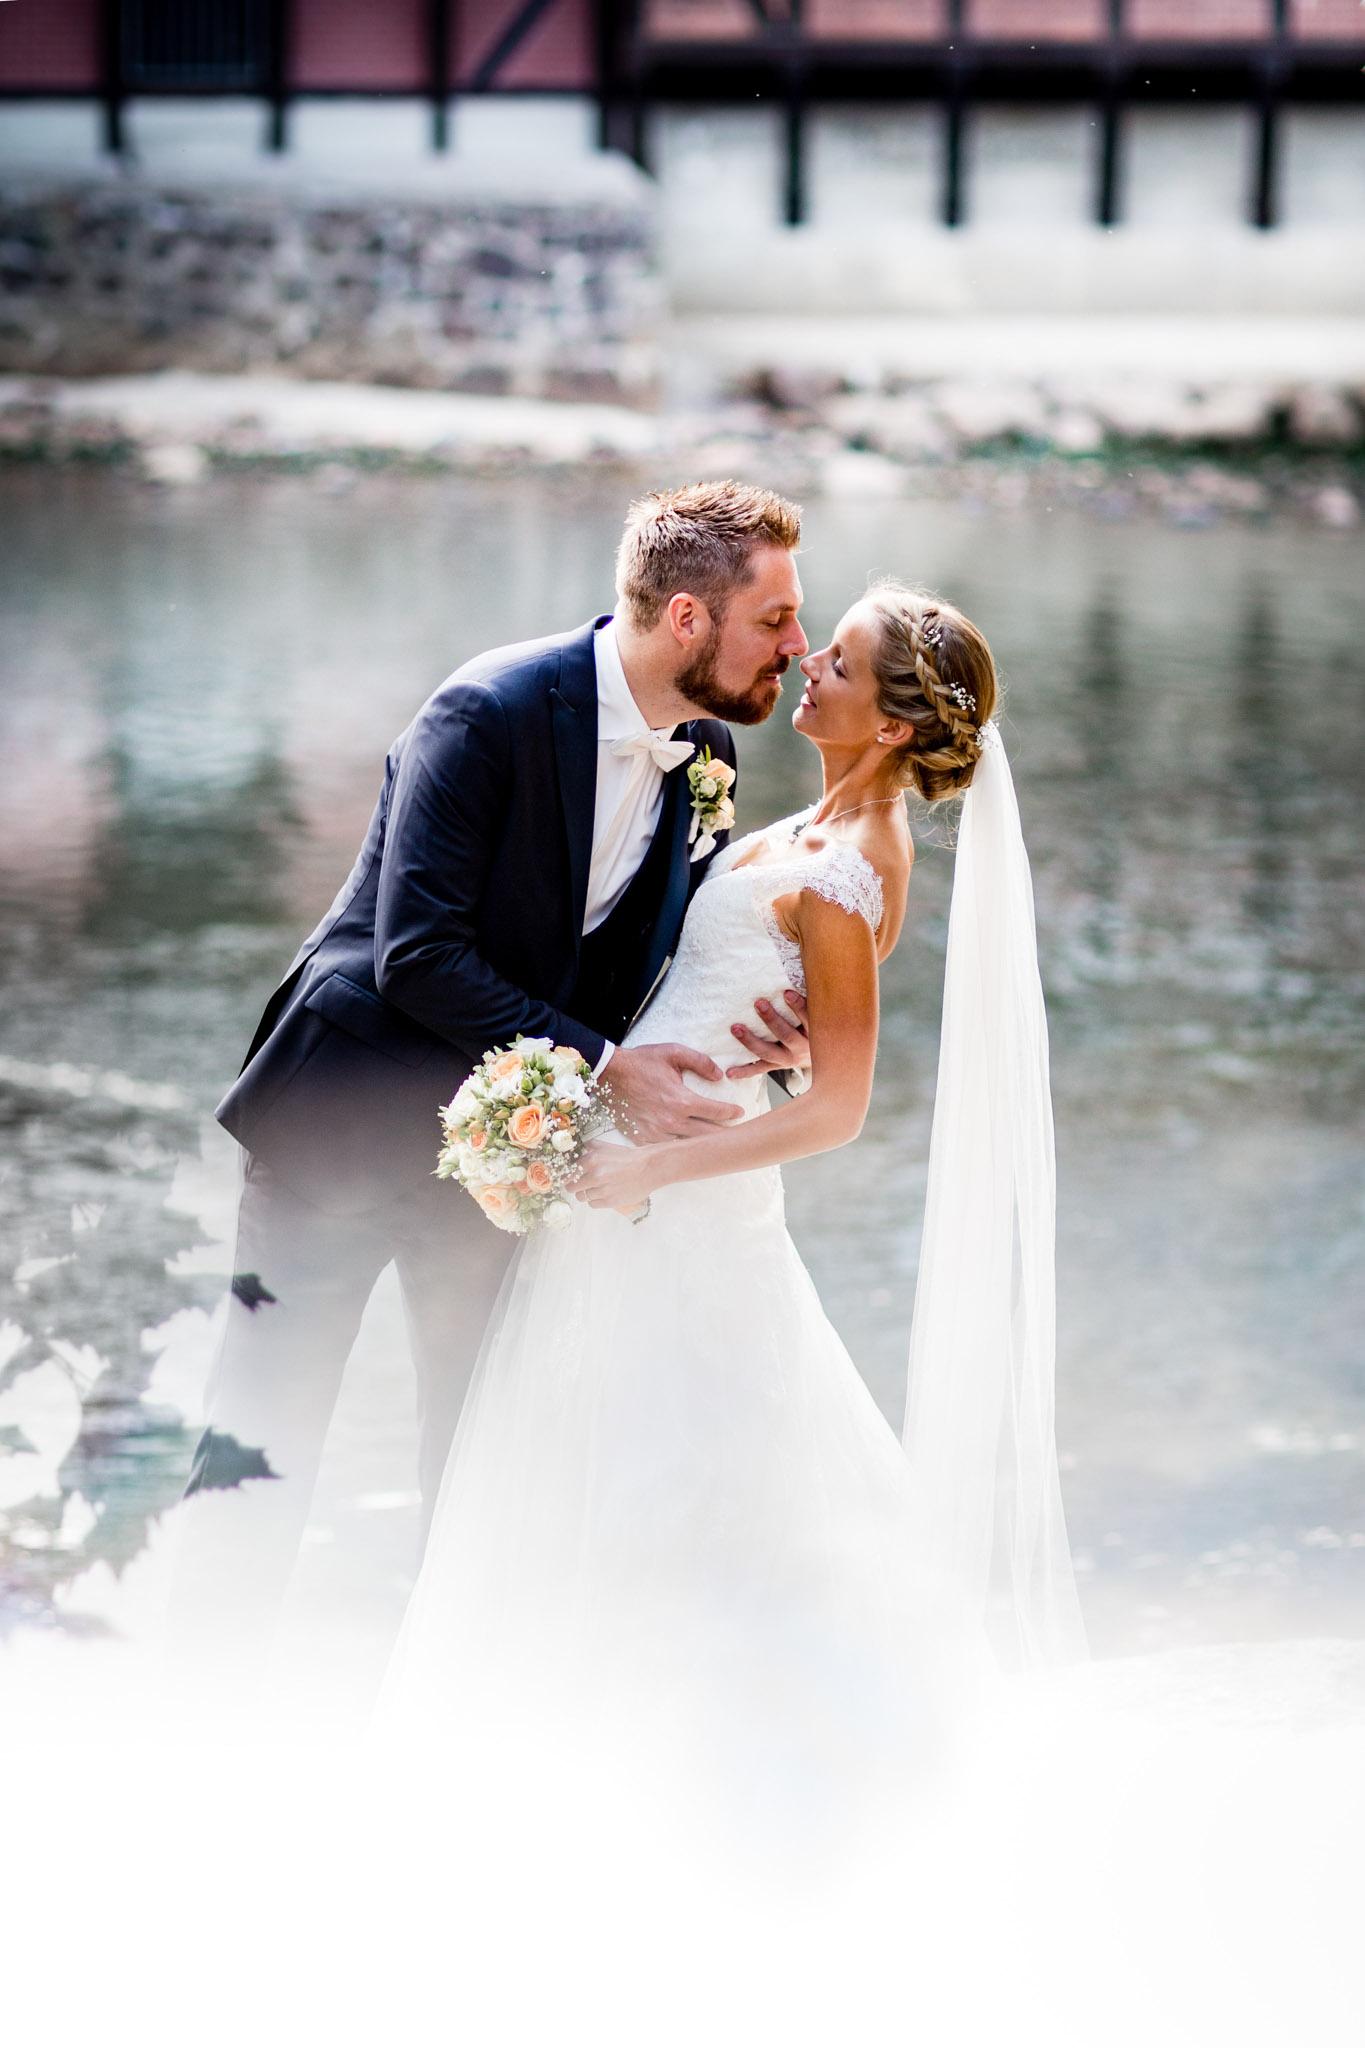 Brautpaarshooting an der Ilmenau